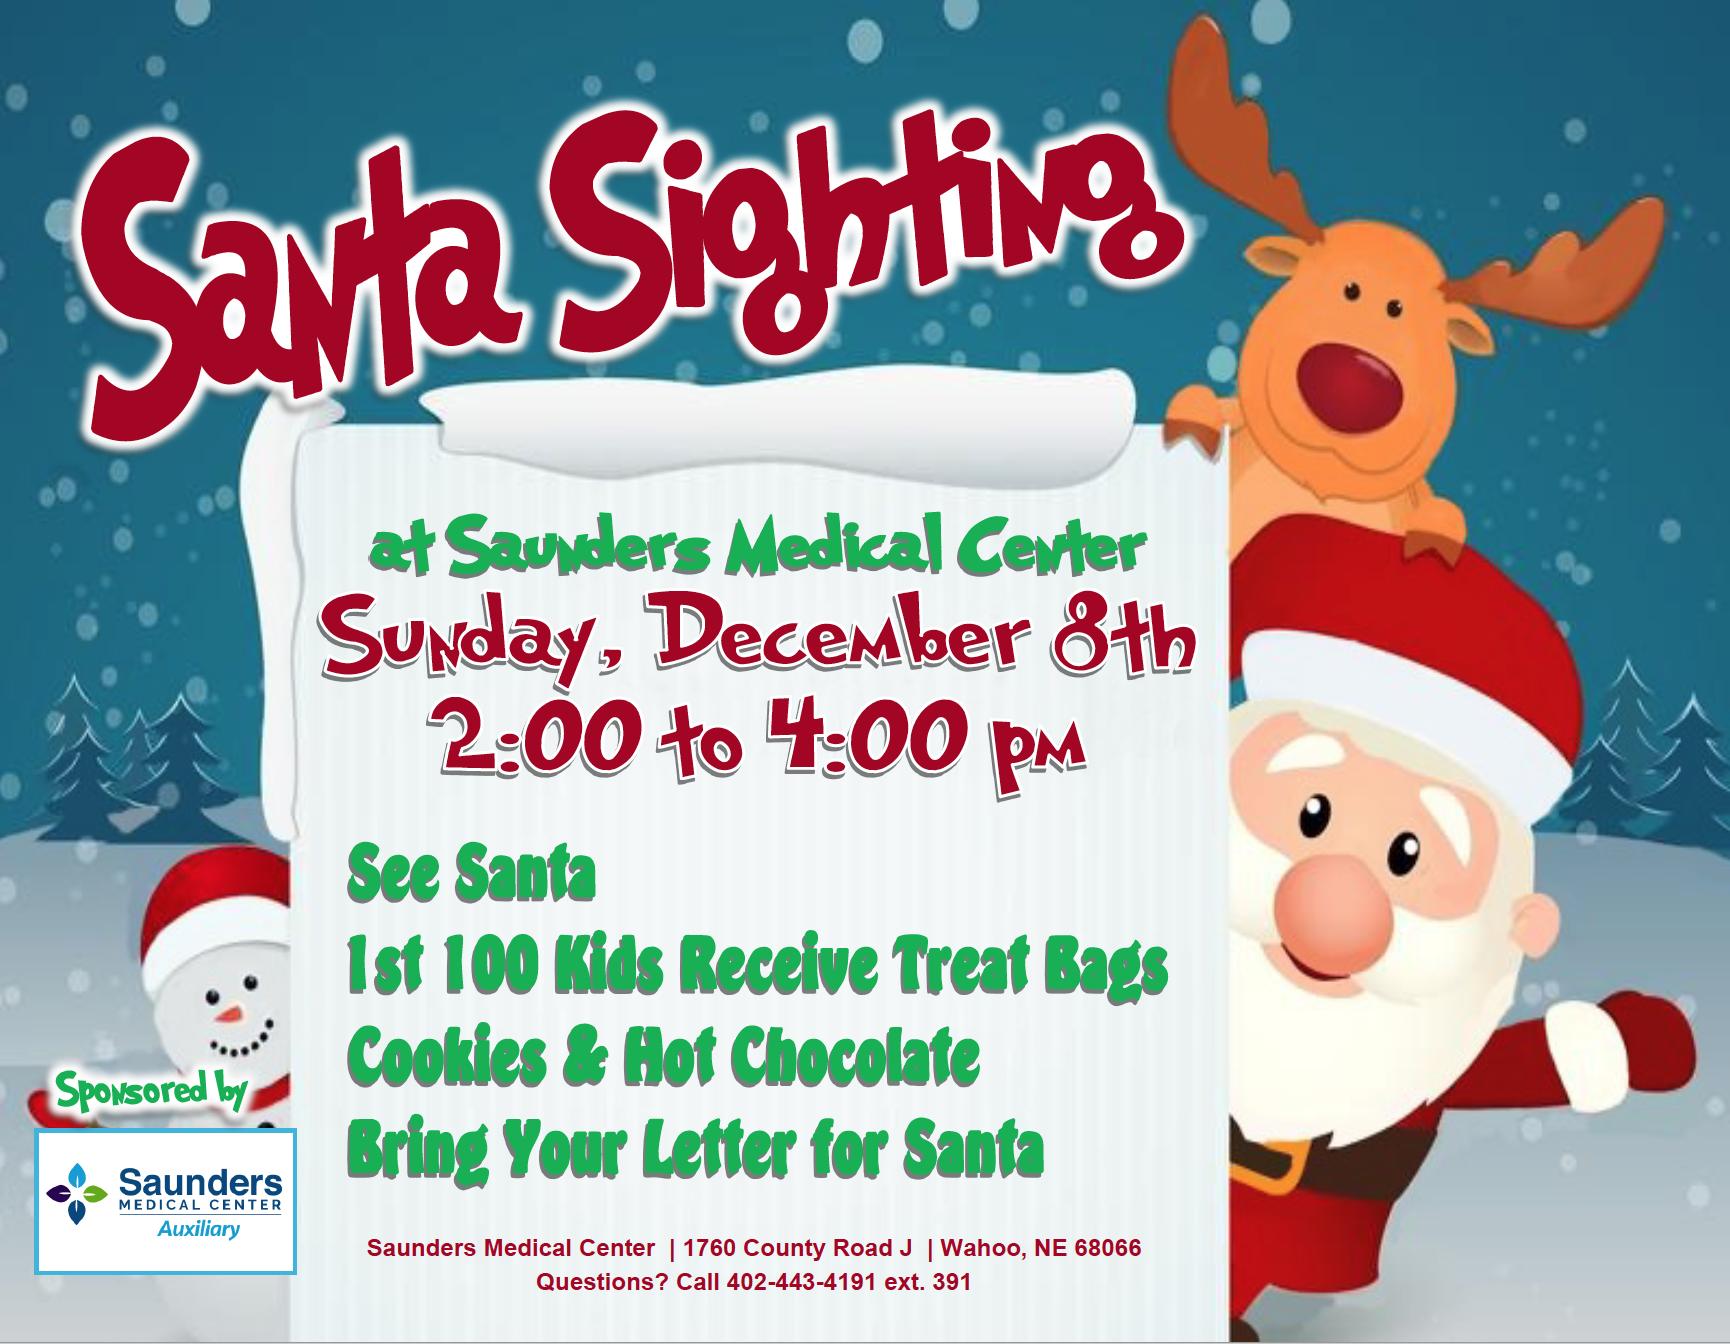 Santa is coming to Wahoo, Nebraska!